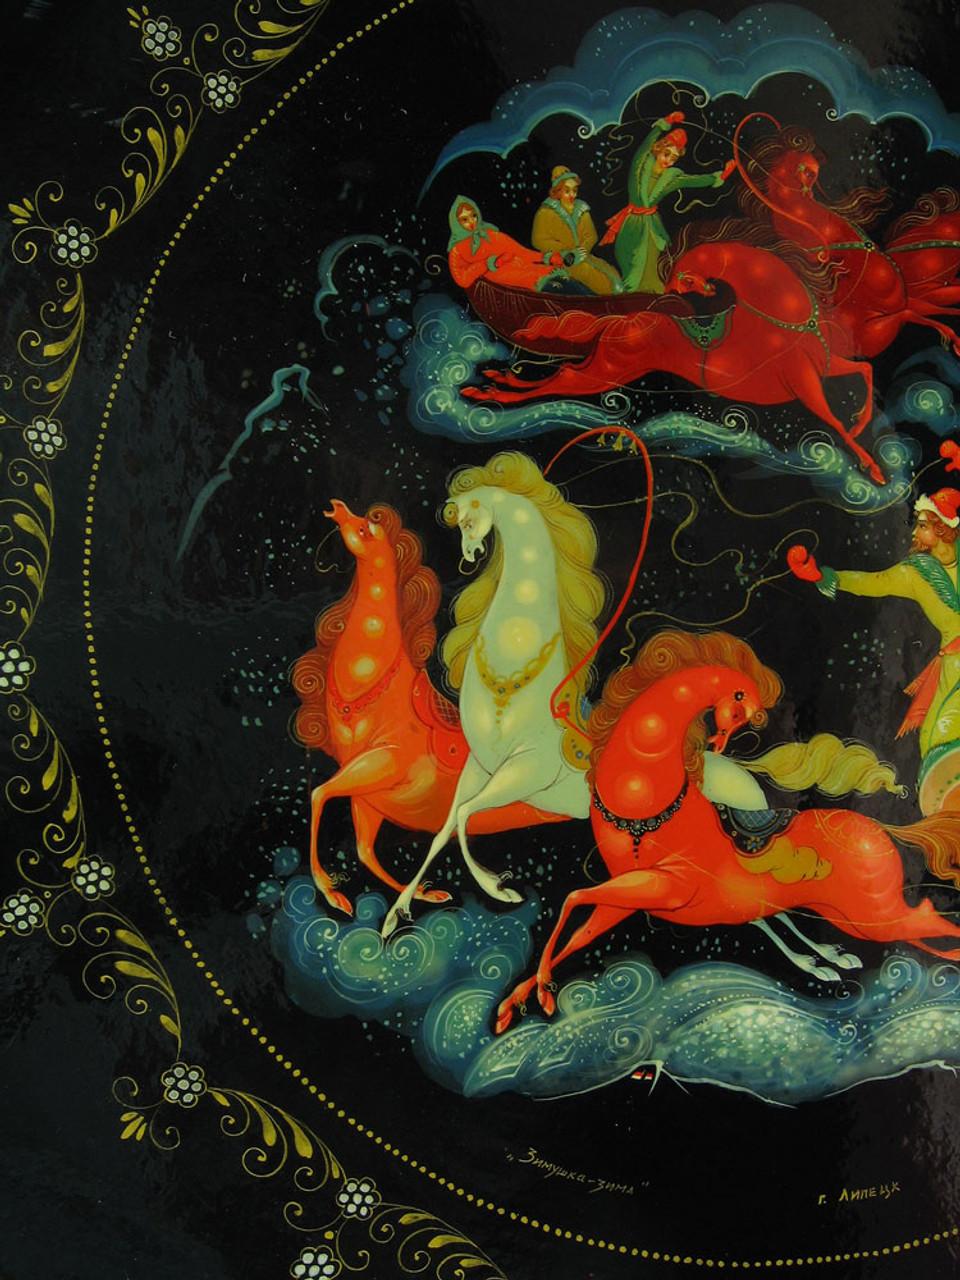 Detail of horses